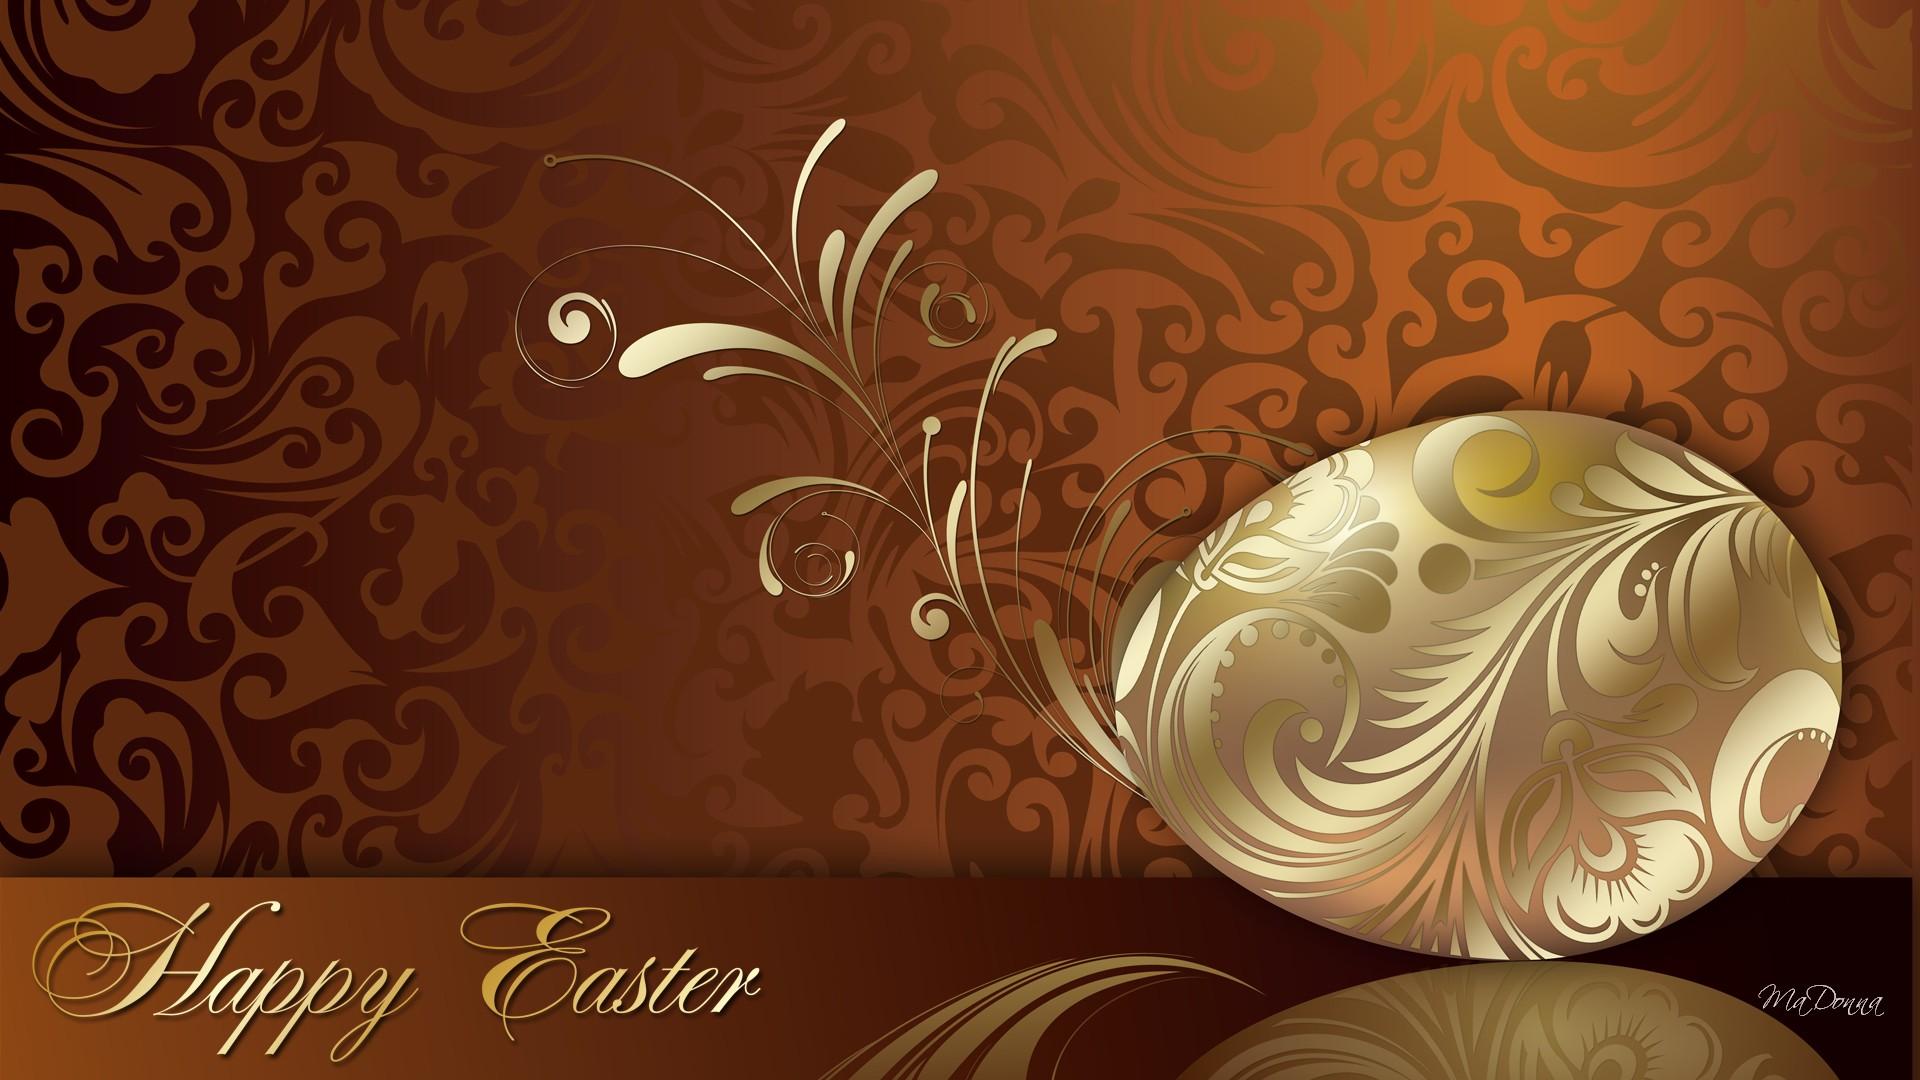 Happy Easter Desktop Wallpaper HD (18)